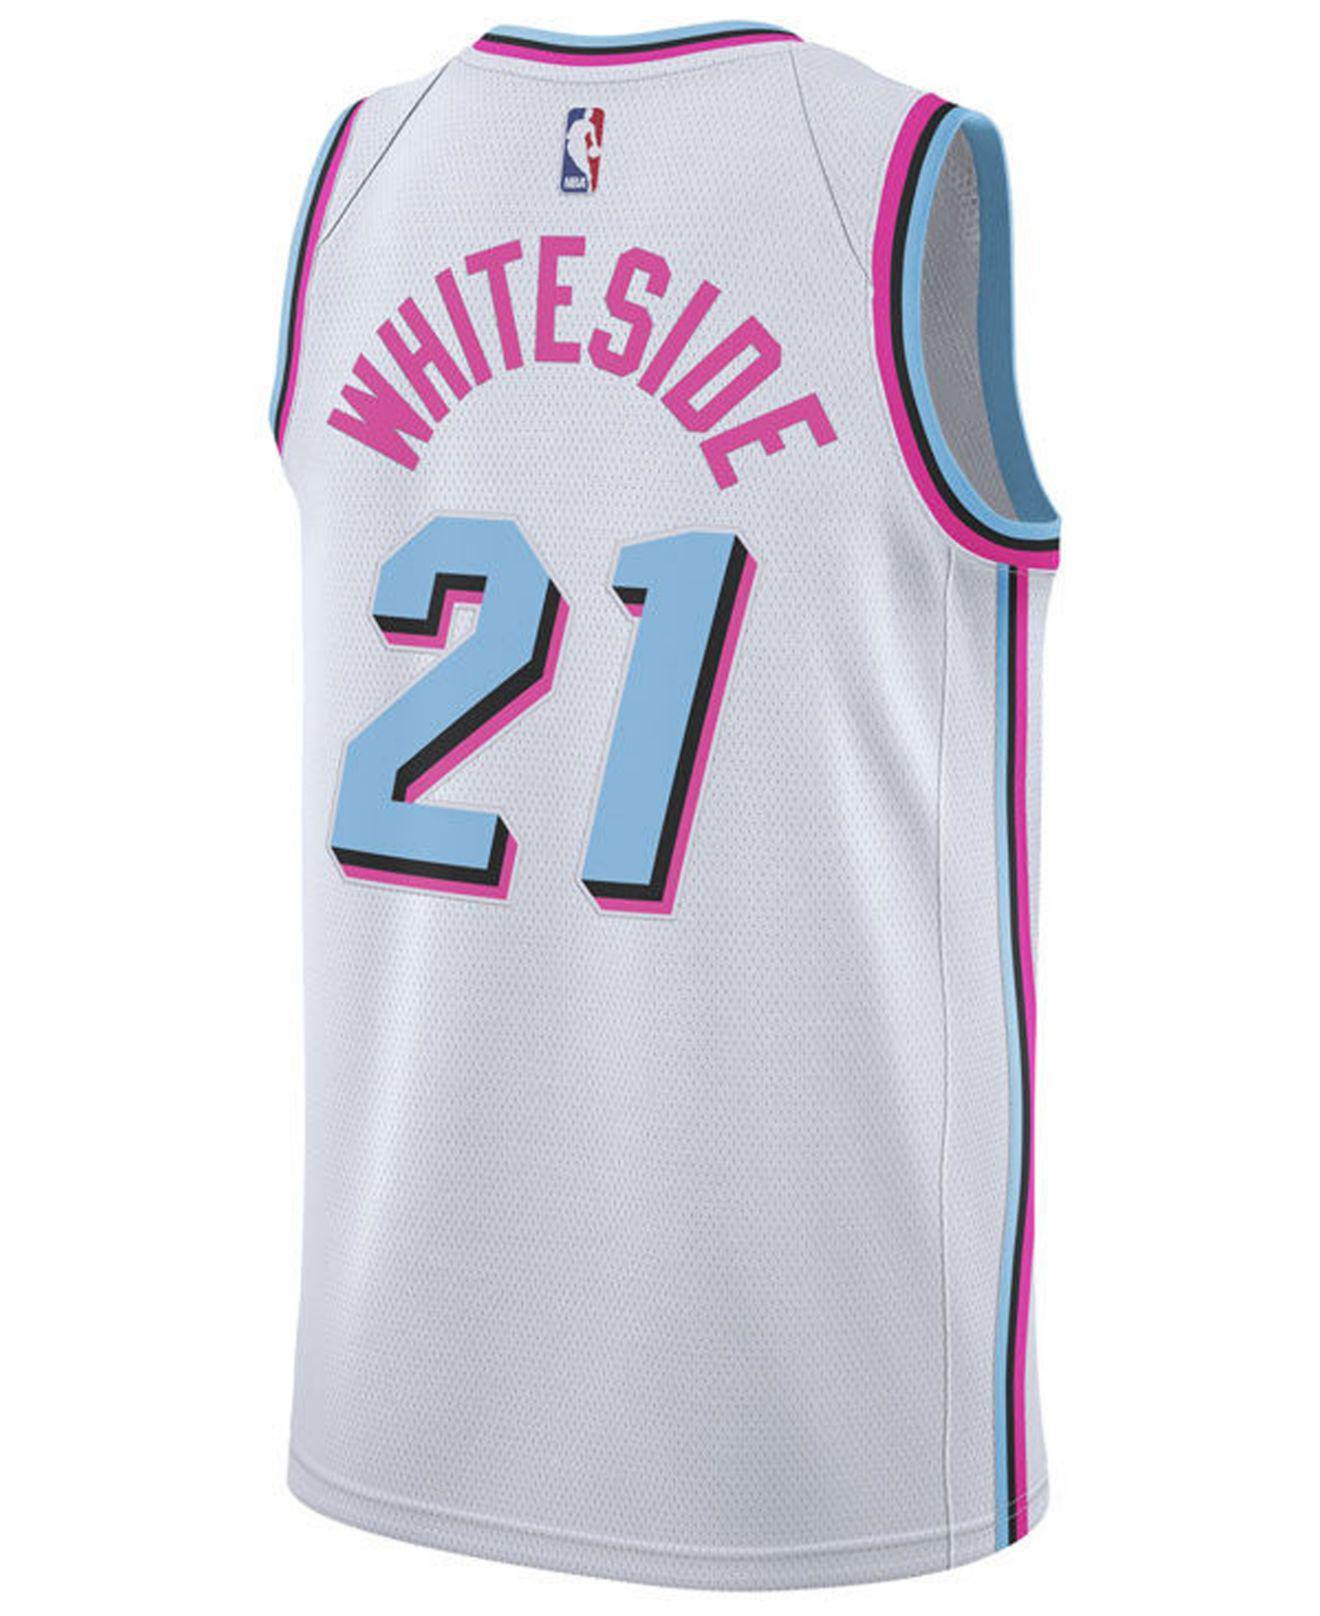 274749fc Lyst - adidas Hassan Whiteside Miami Heat City Swingman Jersey in ...